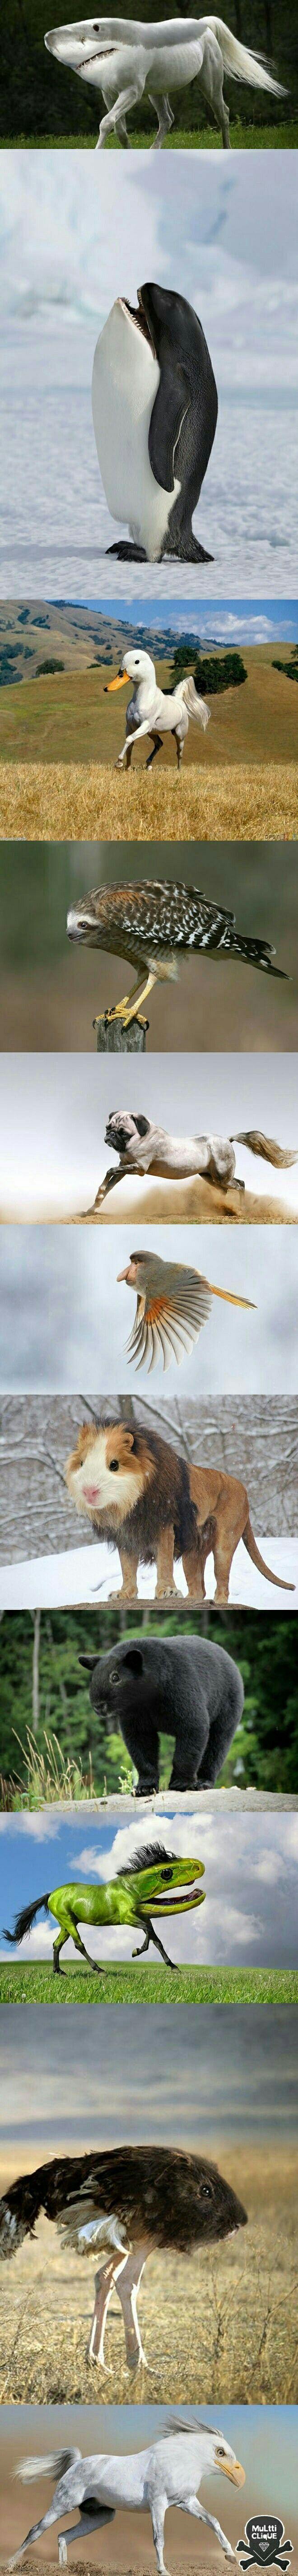 Ha! I love the guinea pig/lion